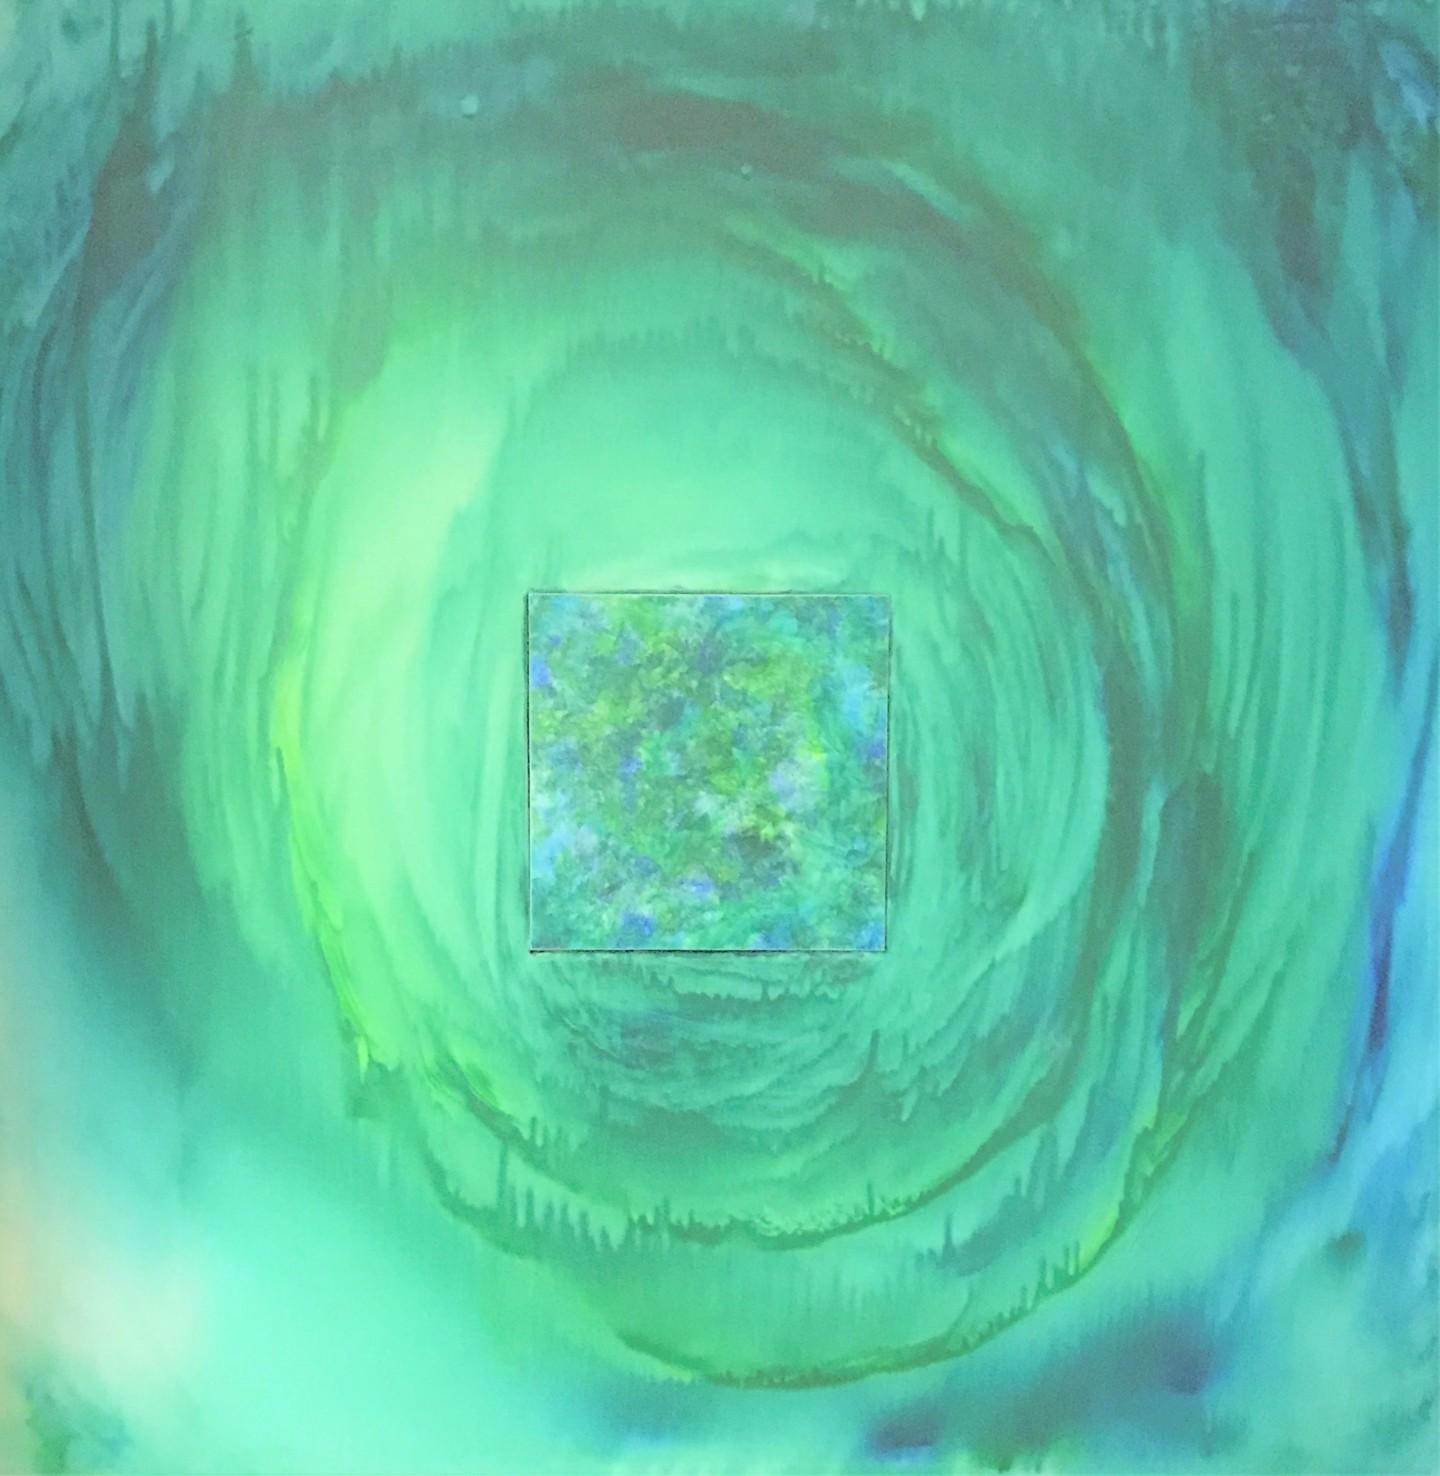 Tiny De Bruin - Patterns of life